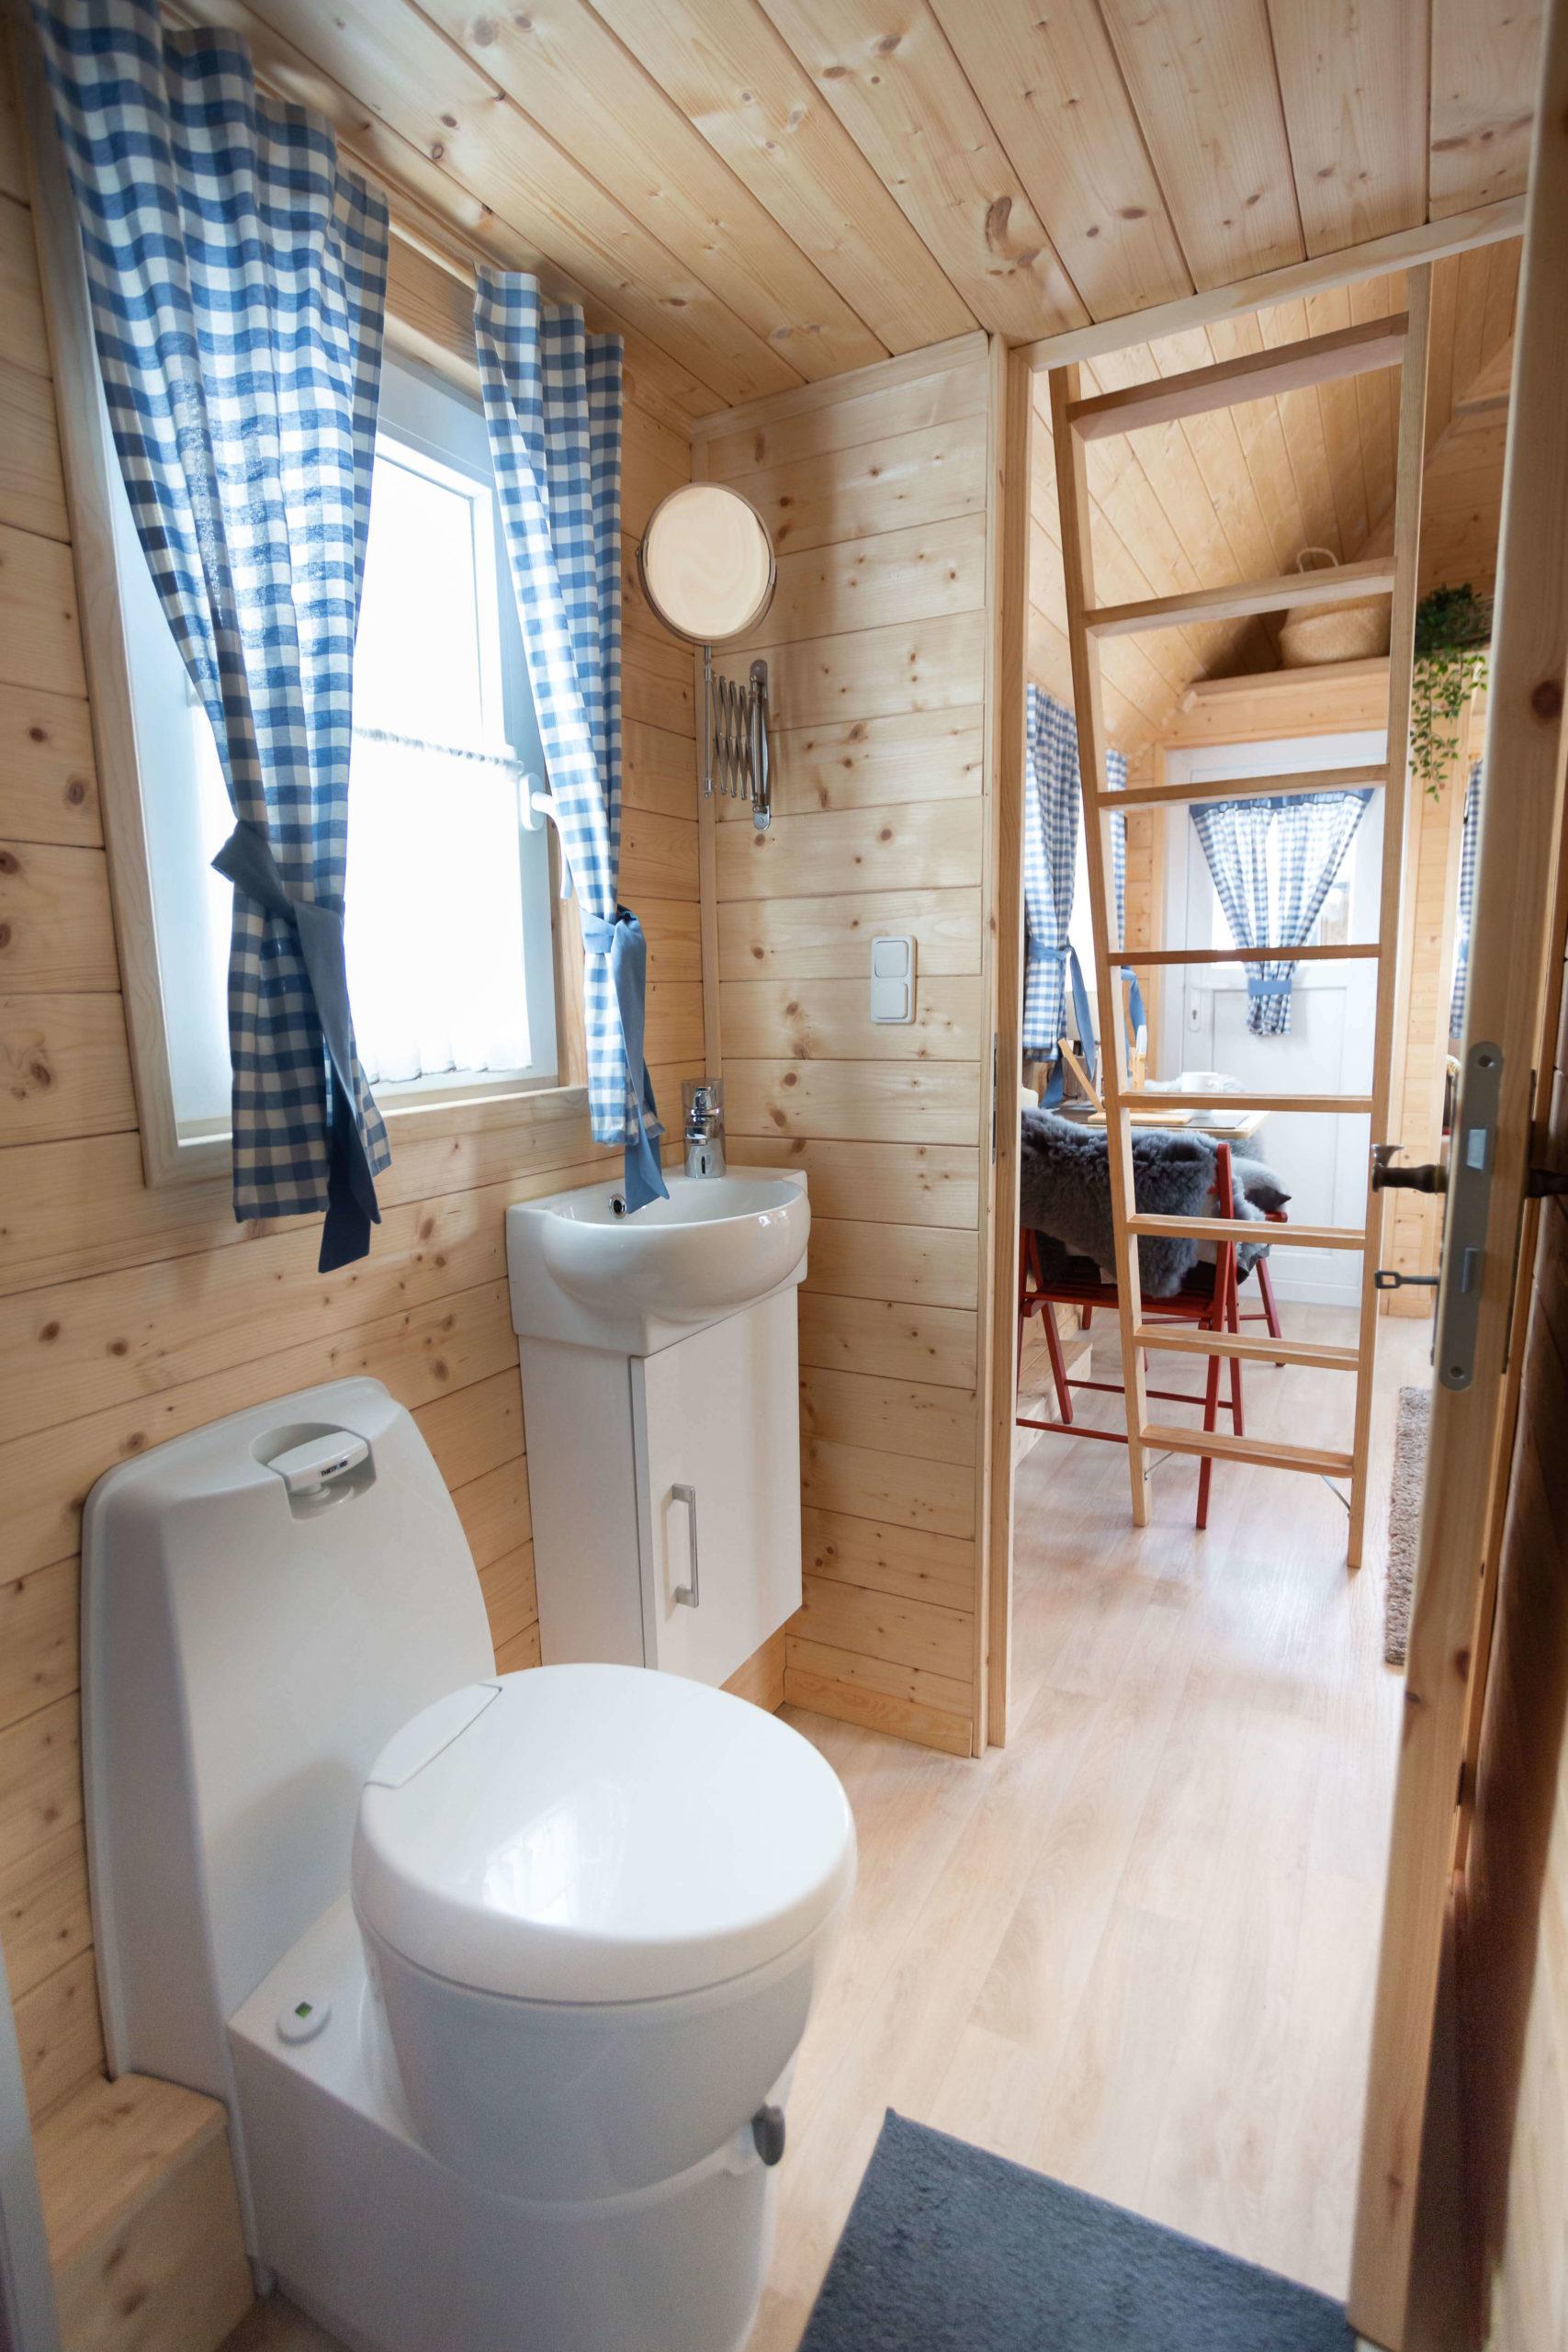 mobiles-tiny-house-island-vital-camp-gmbh-38